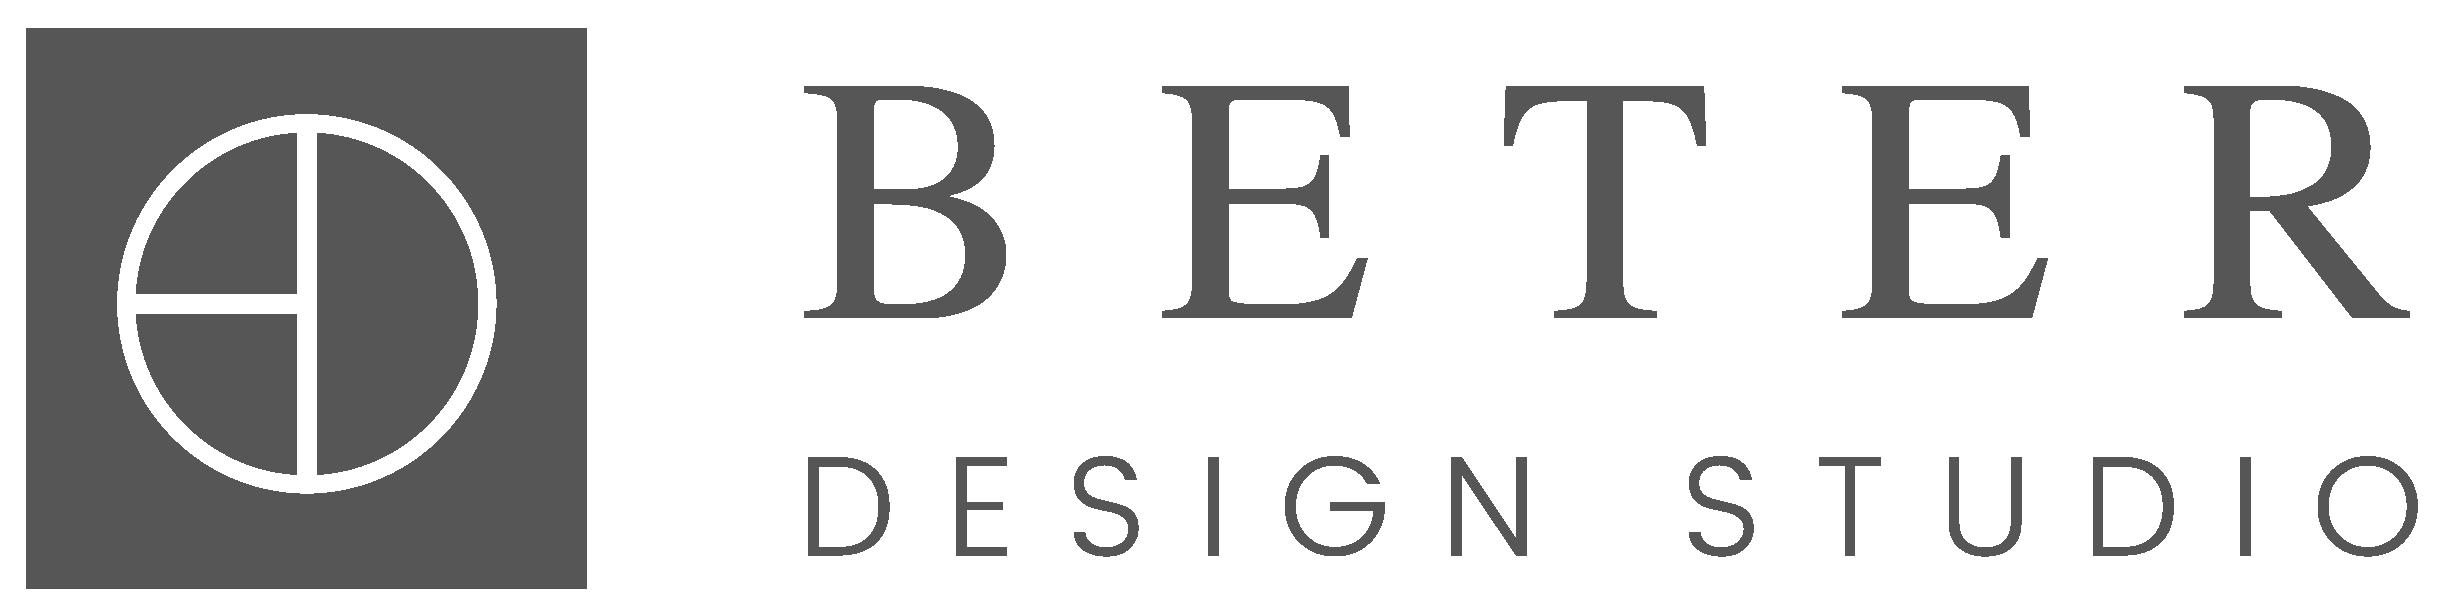 Beter Design